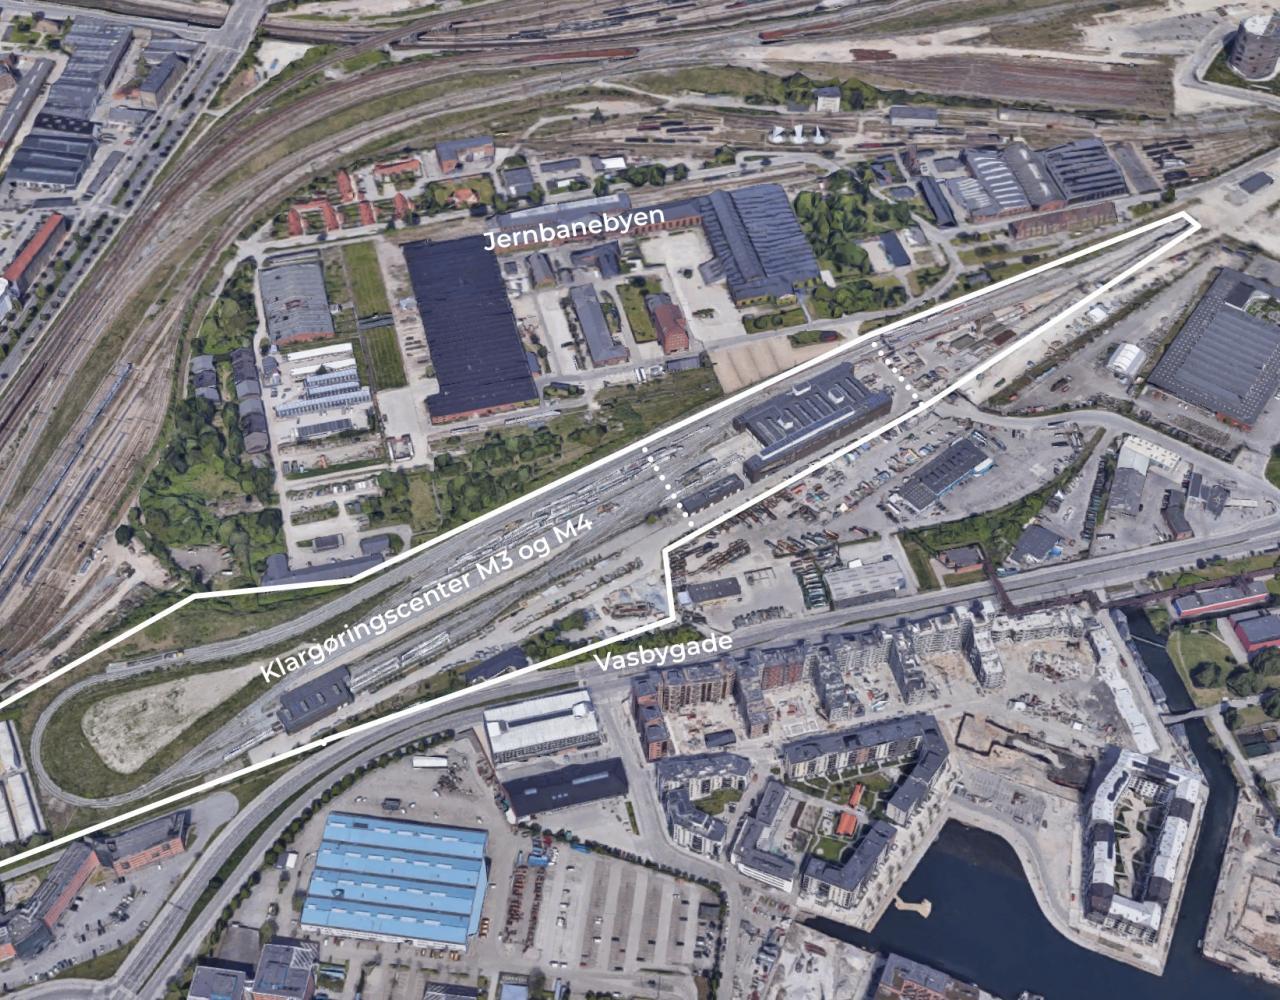 Kort metro klargøringscenter jernbanebyen